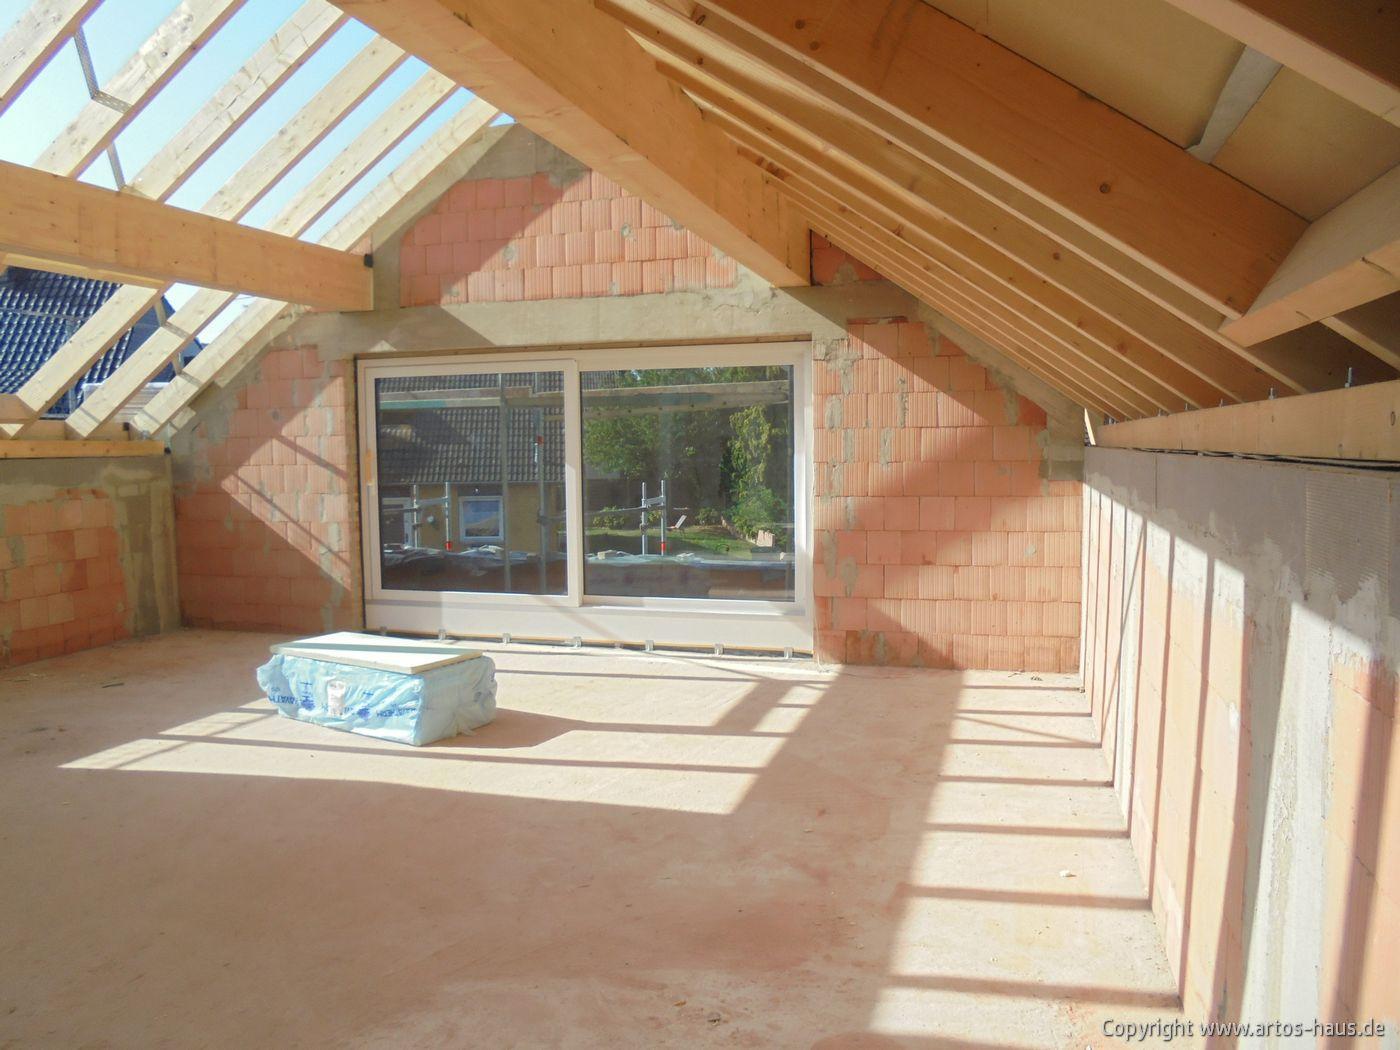 Fenstereinbau MFH Pulheim / ARTOS-HAUS Bild 6